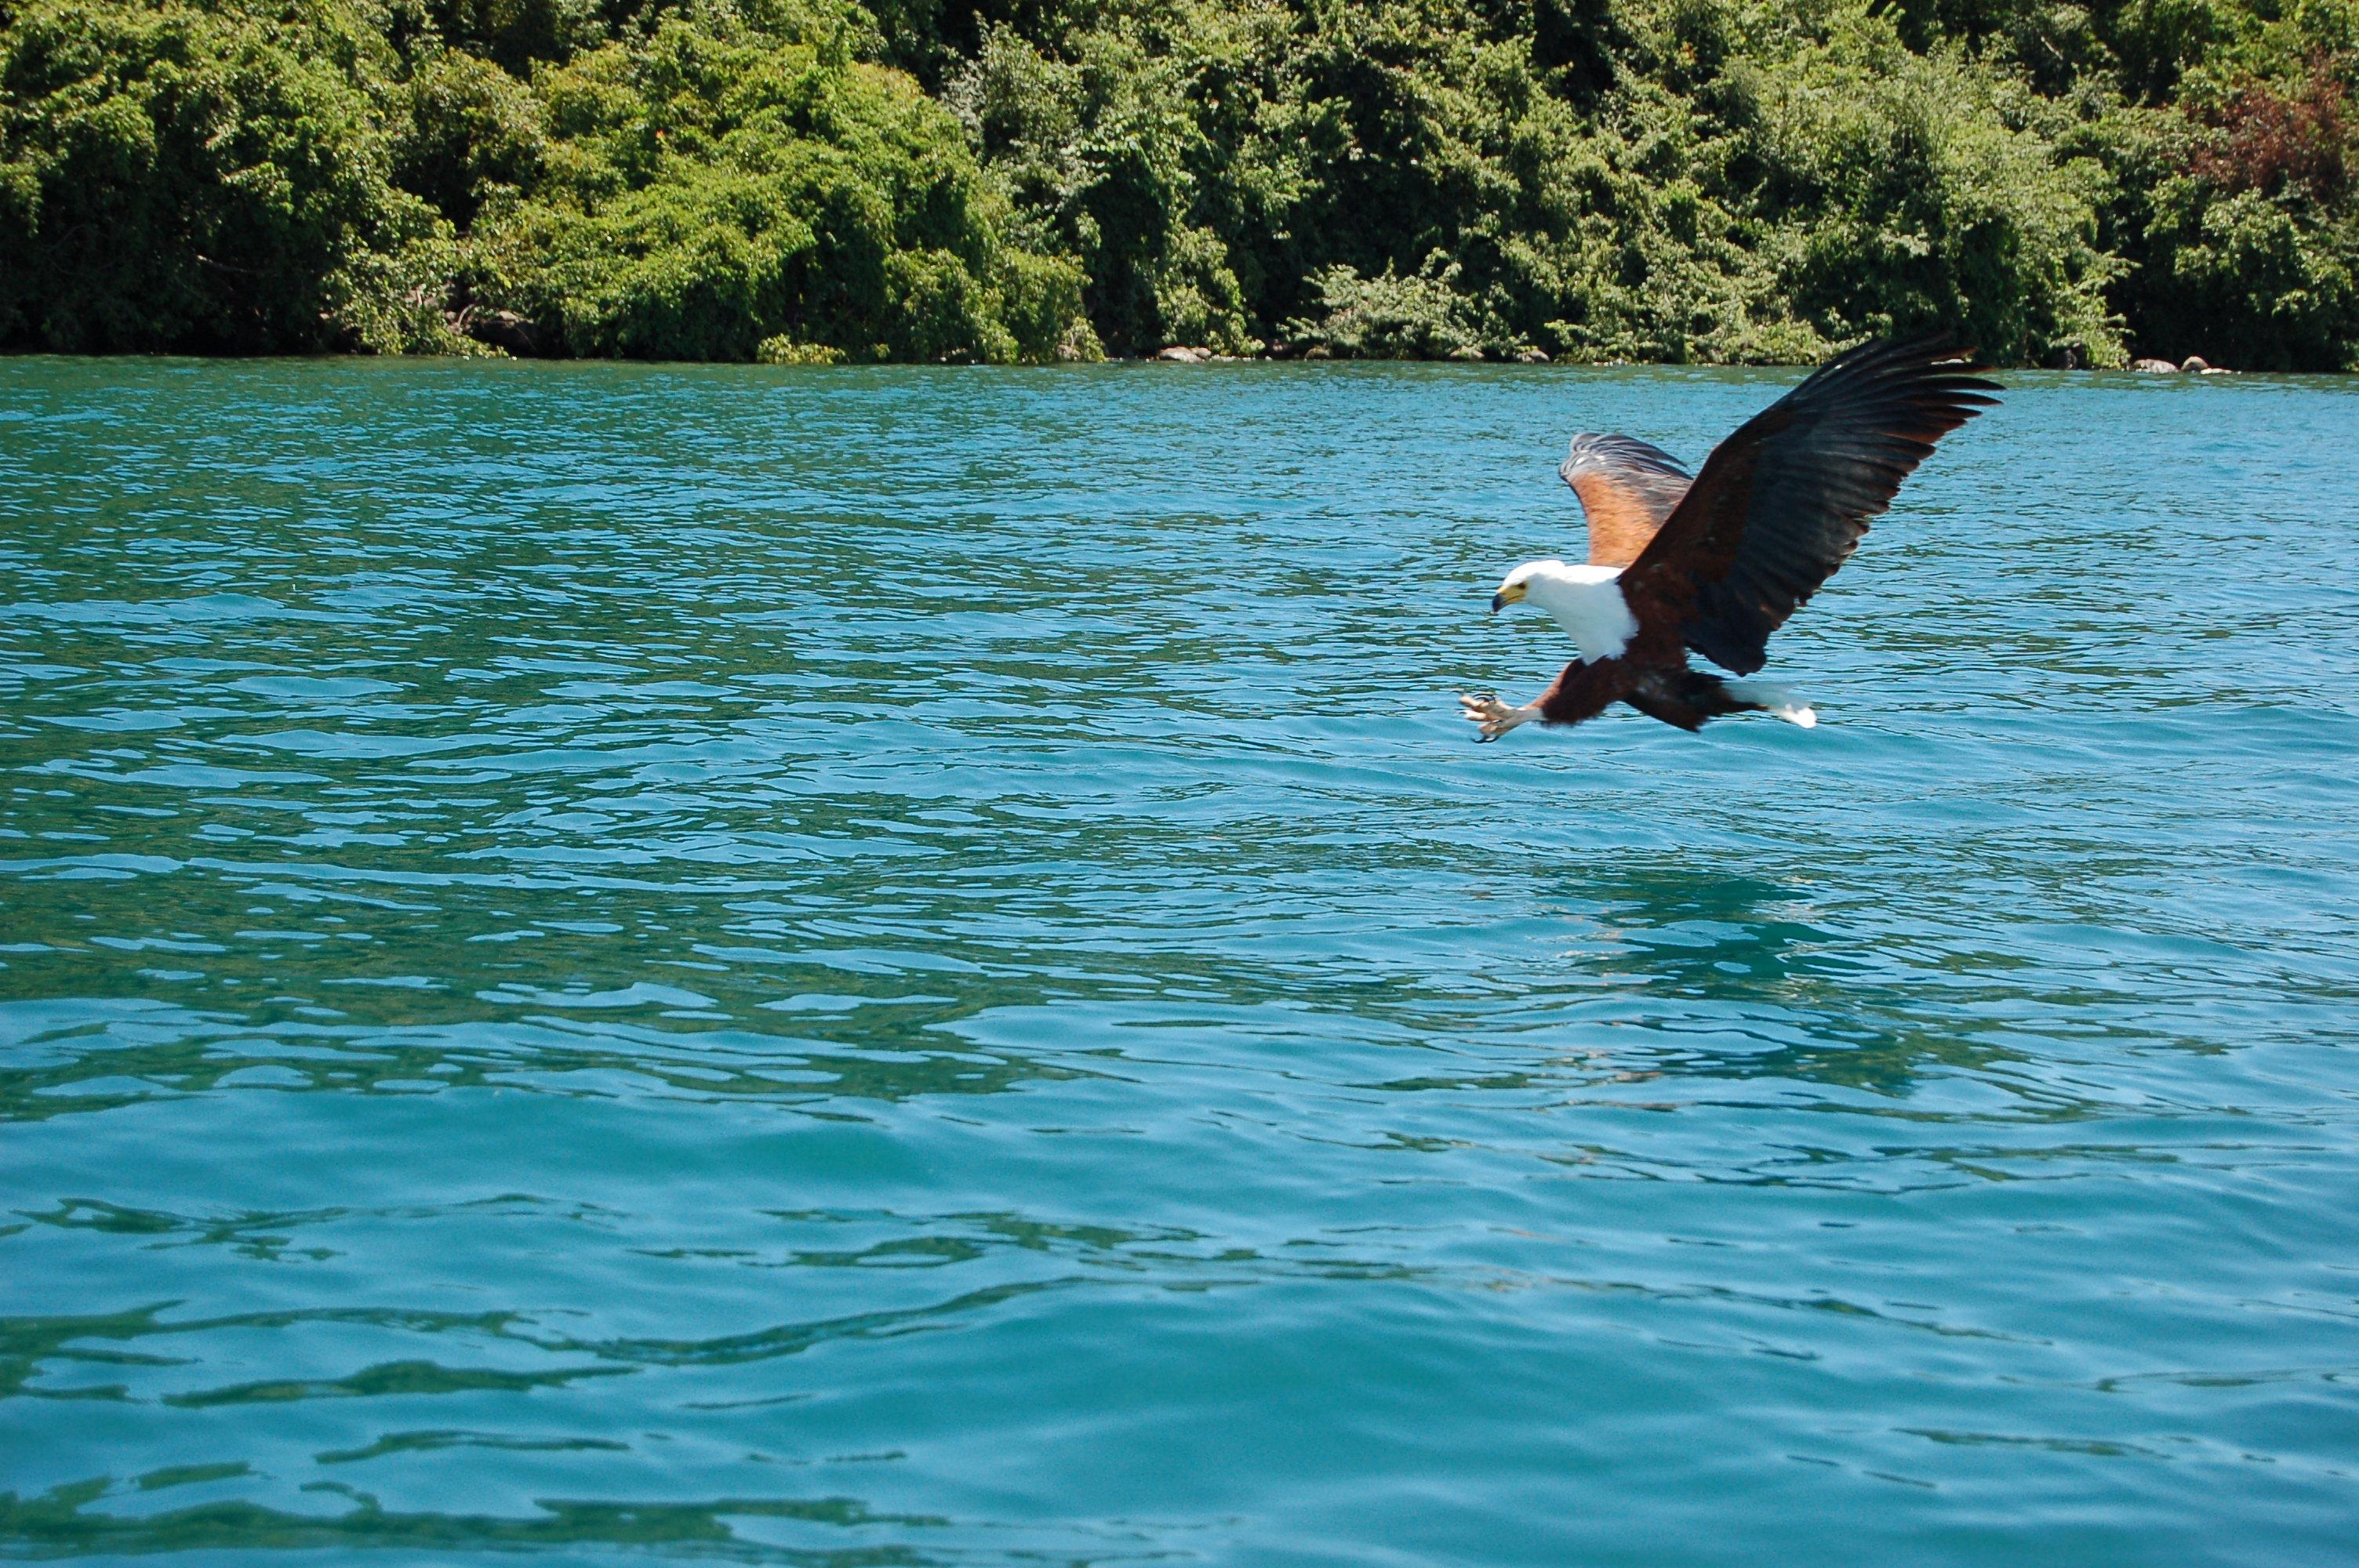 Haliaeetus_vocifer_-Cape_Maclear,_Malawi_-fishing-8